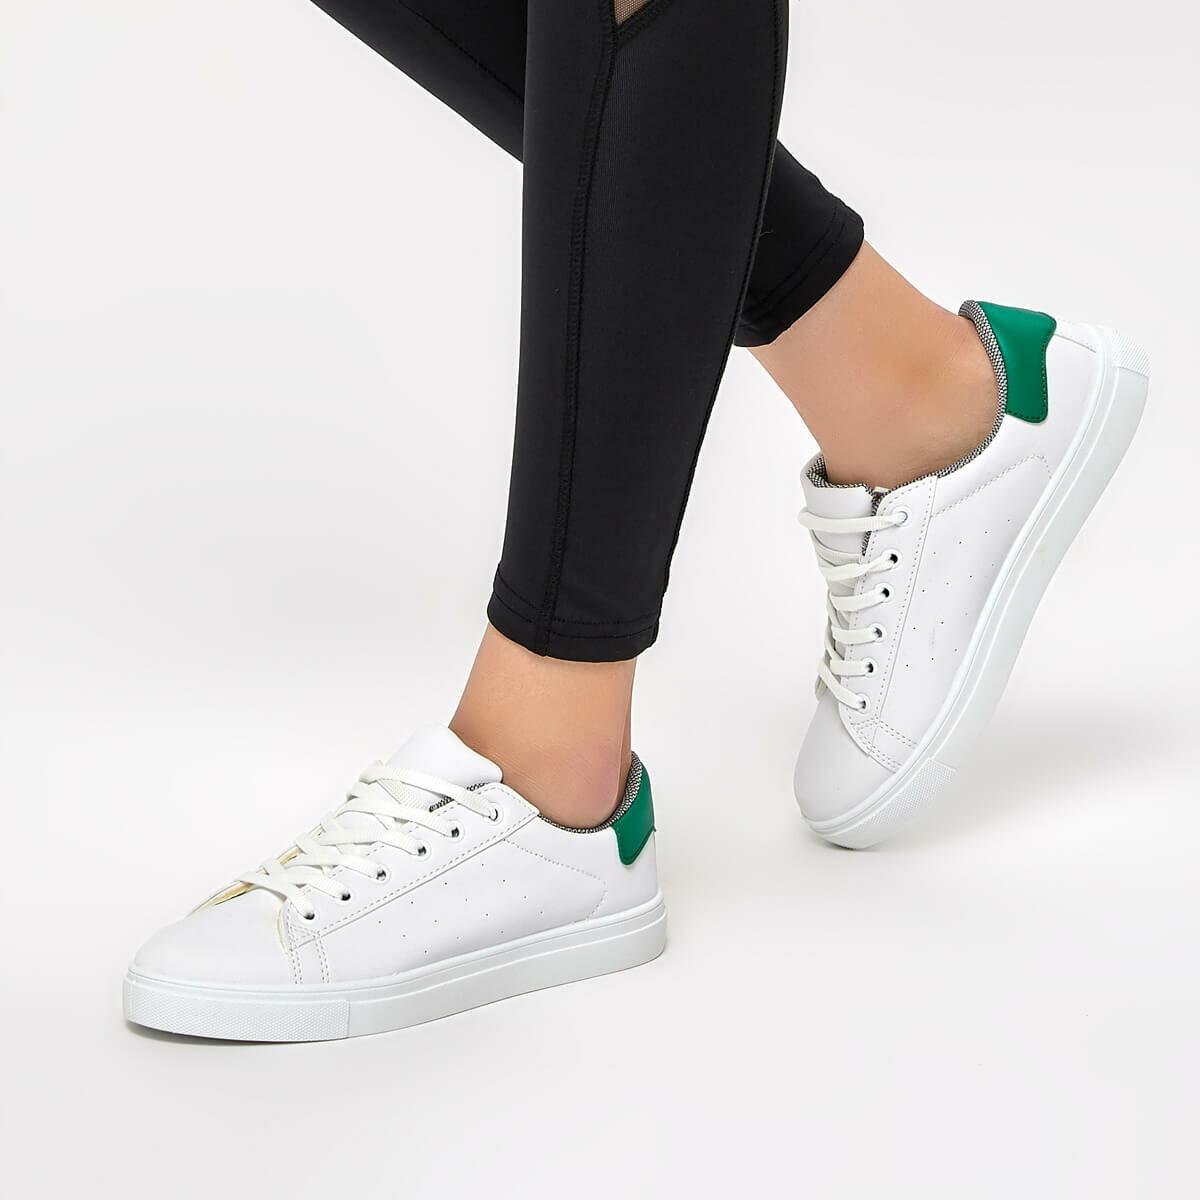 FLO 91. 354921.Z Green Women 'S Shoes Polaris